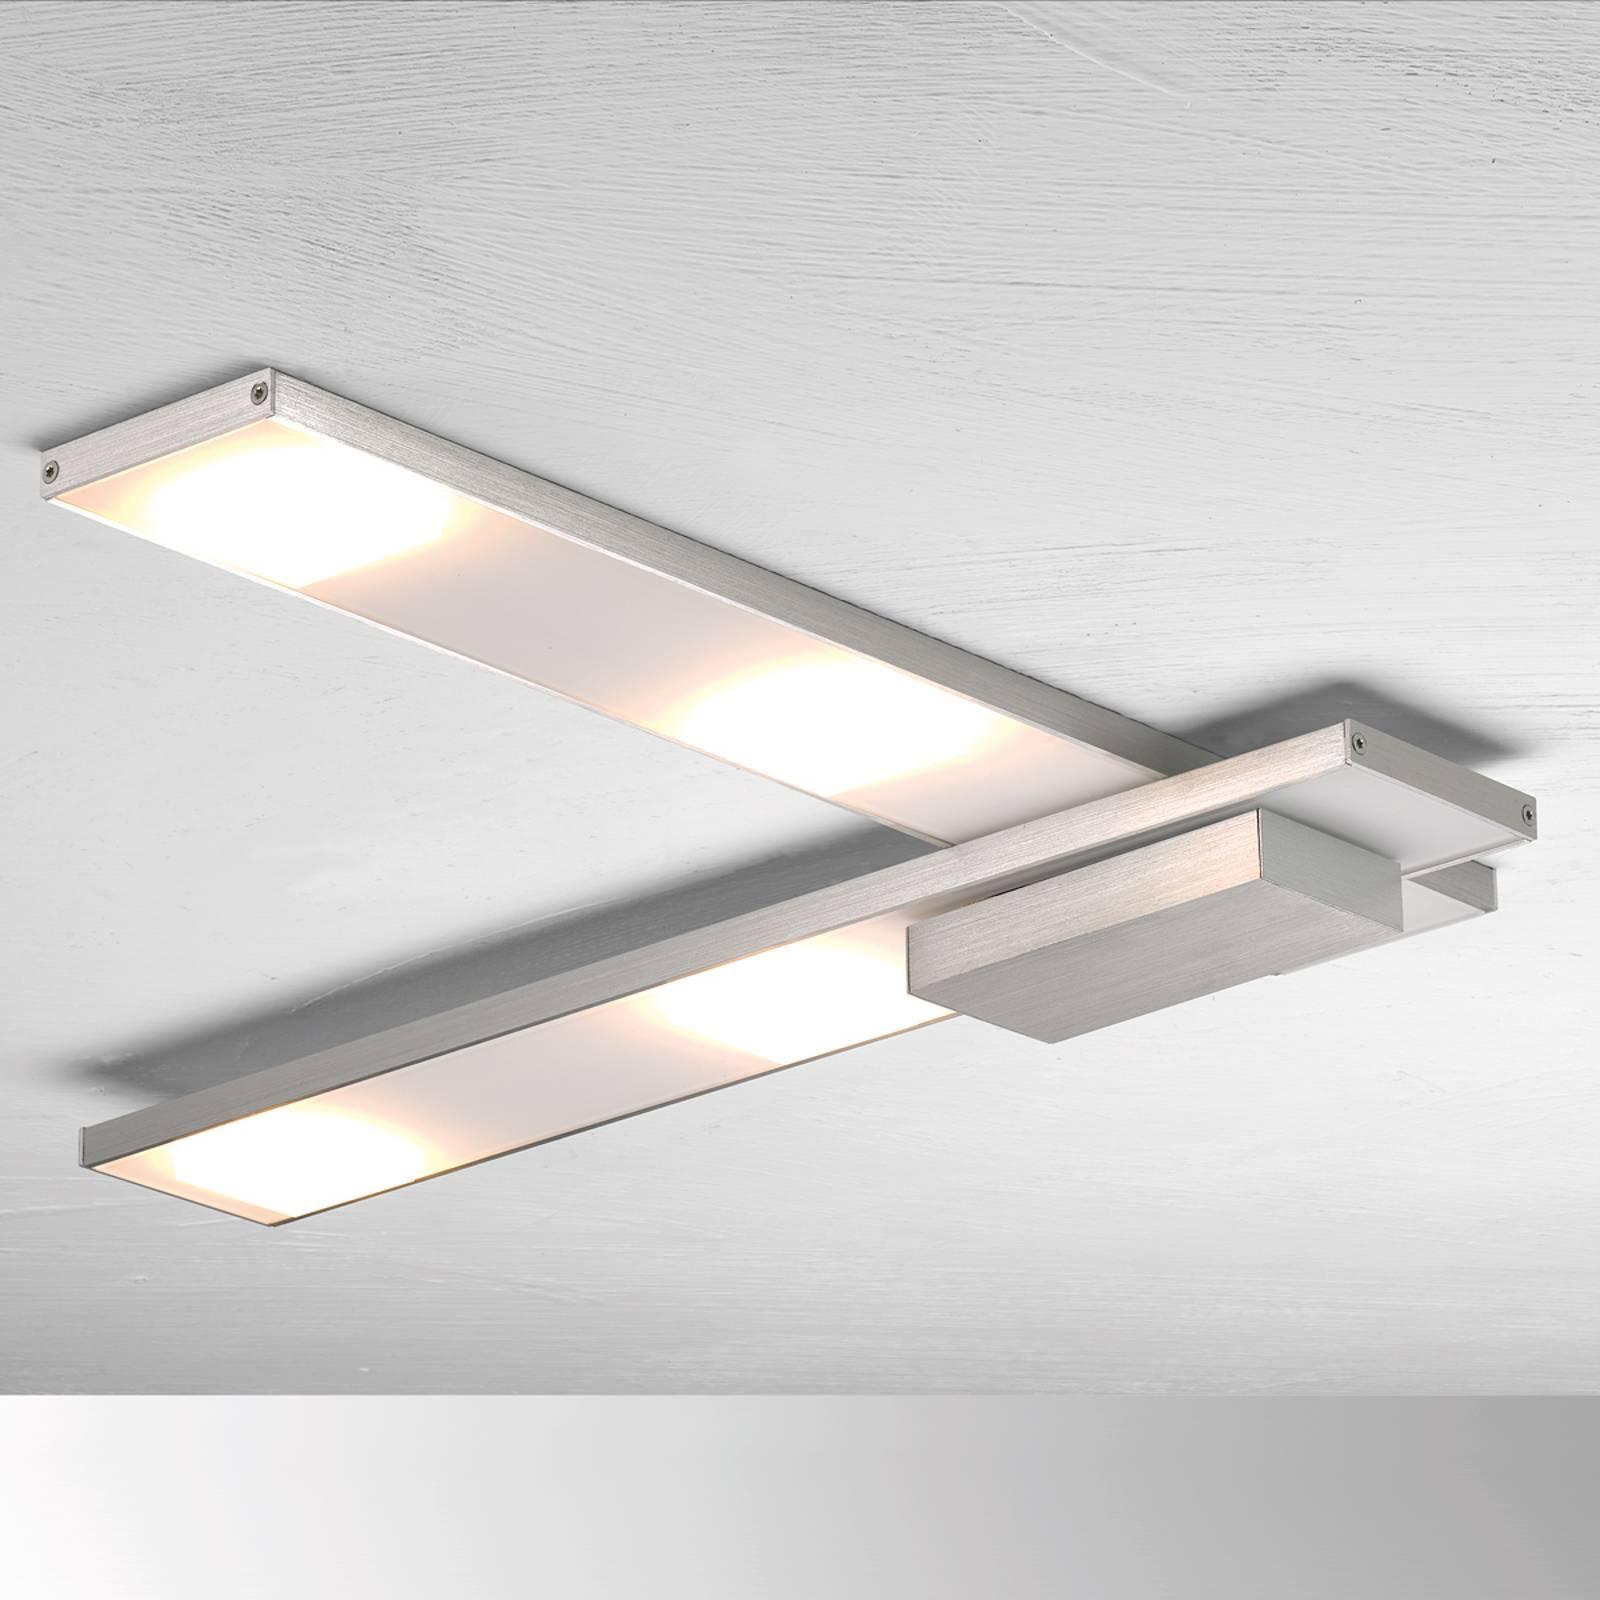 Geraffineerde LED plafondlamp Slight, aluminium